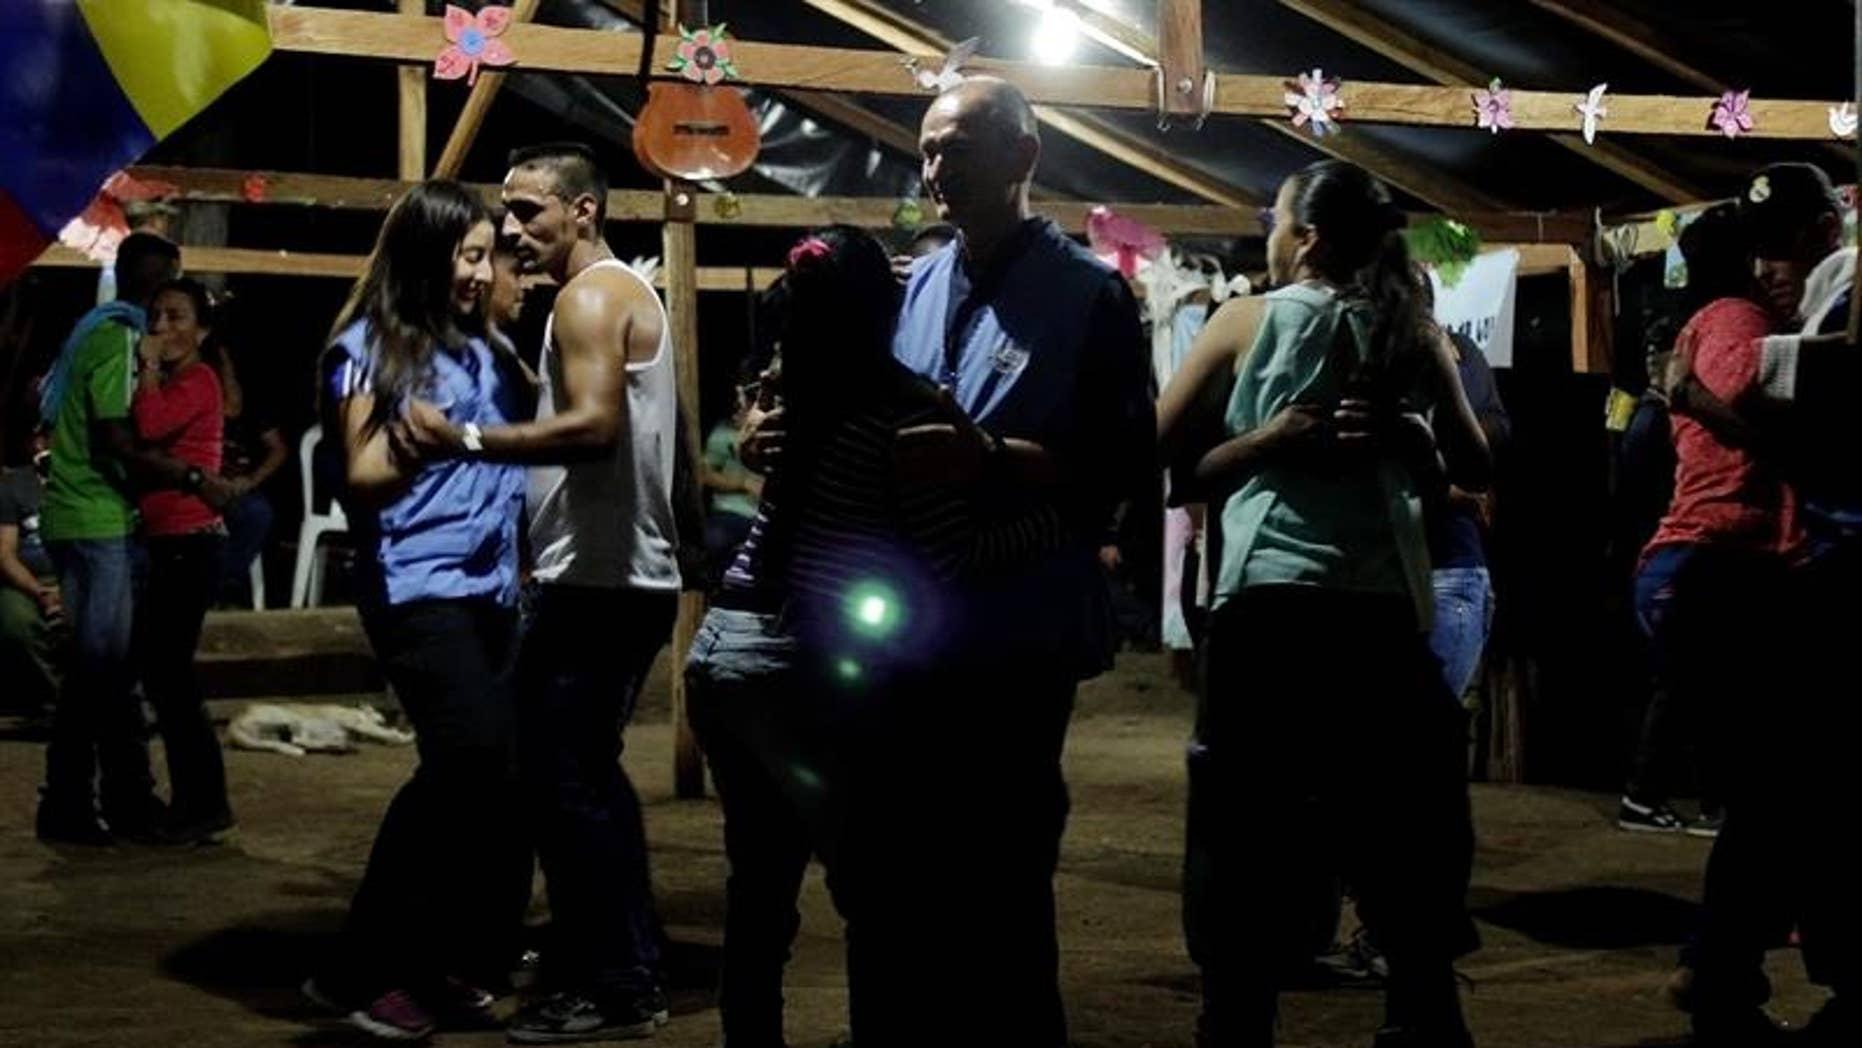 FARC rebels dancing in Colombia.